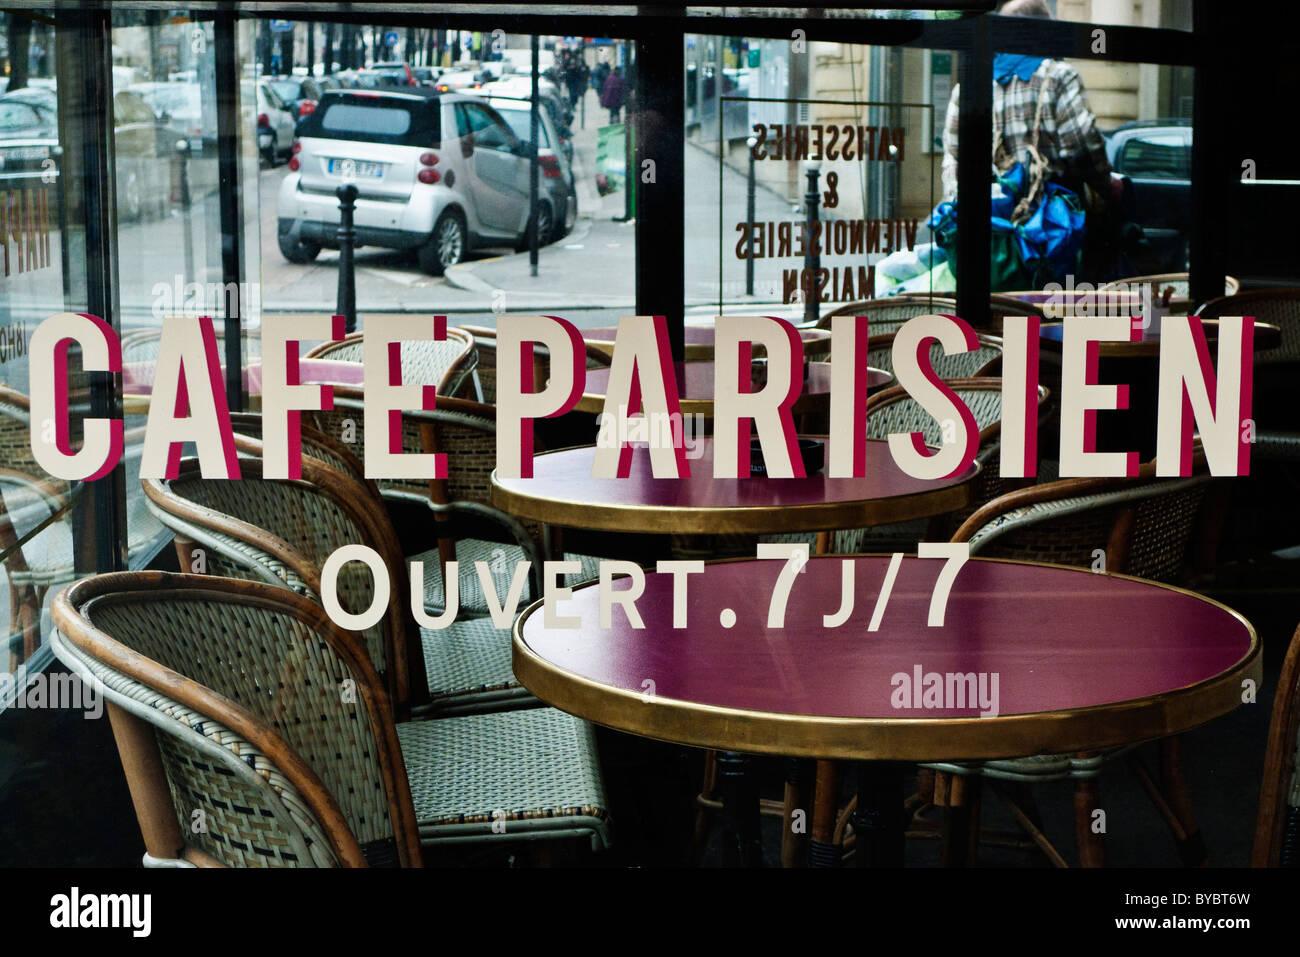 Parisian caf paris france stock photo royalty free image 34066561 alamy - Camif paris ...